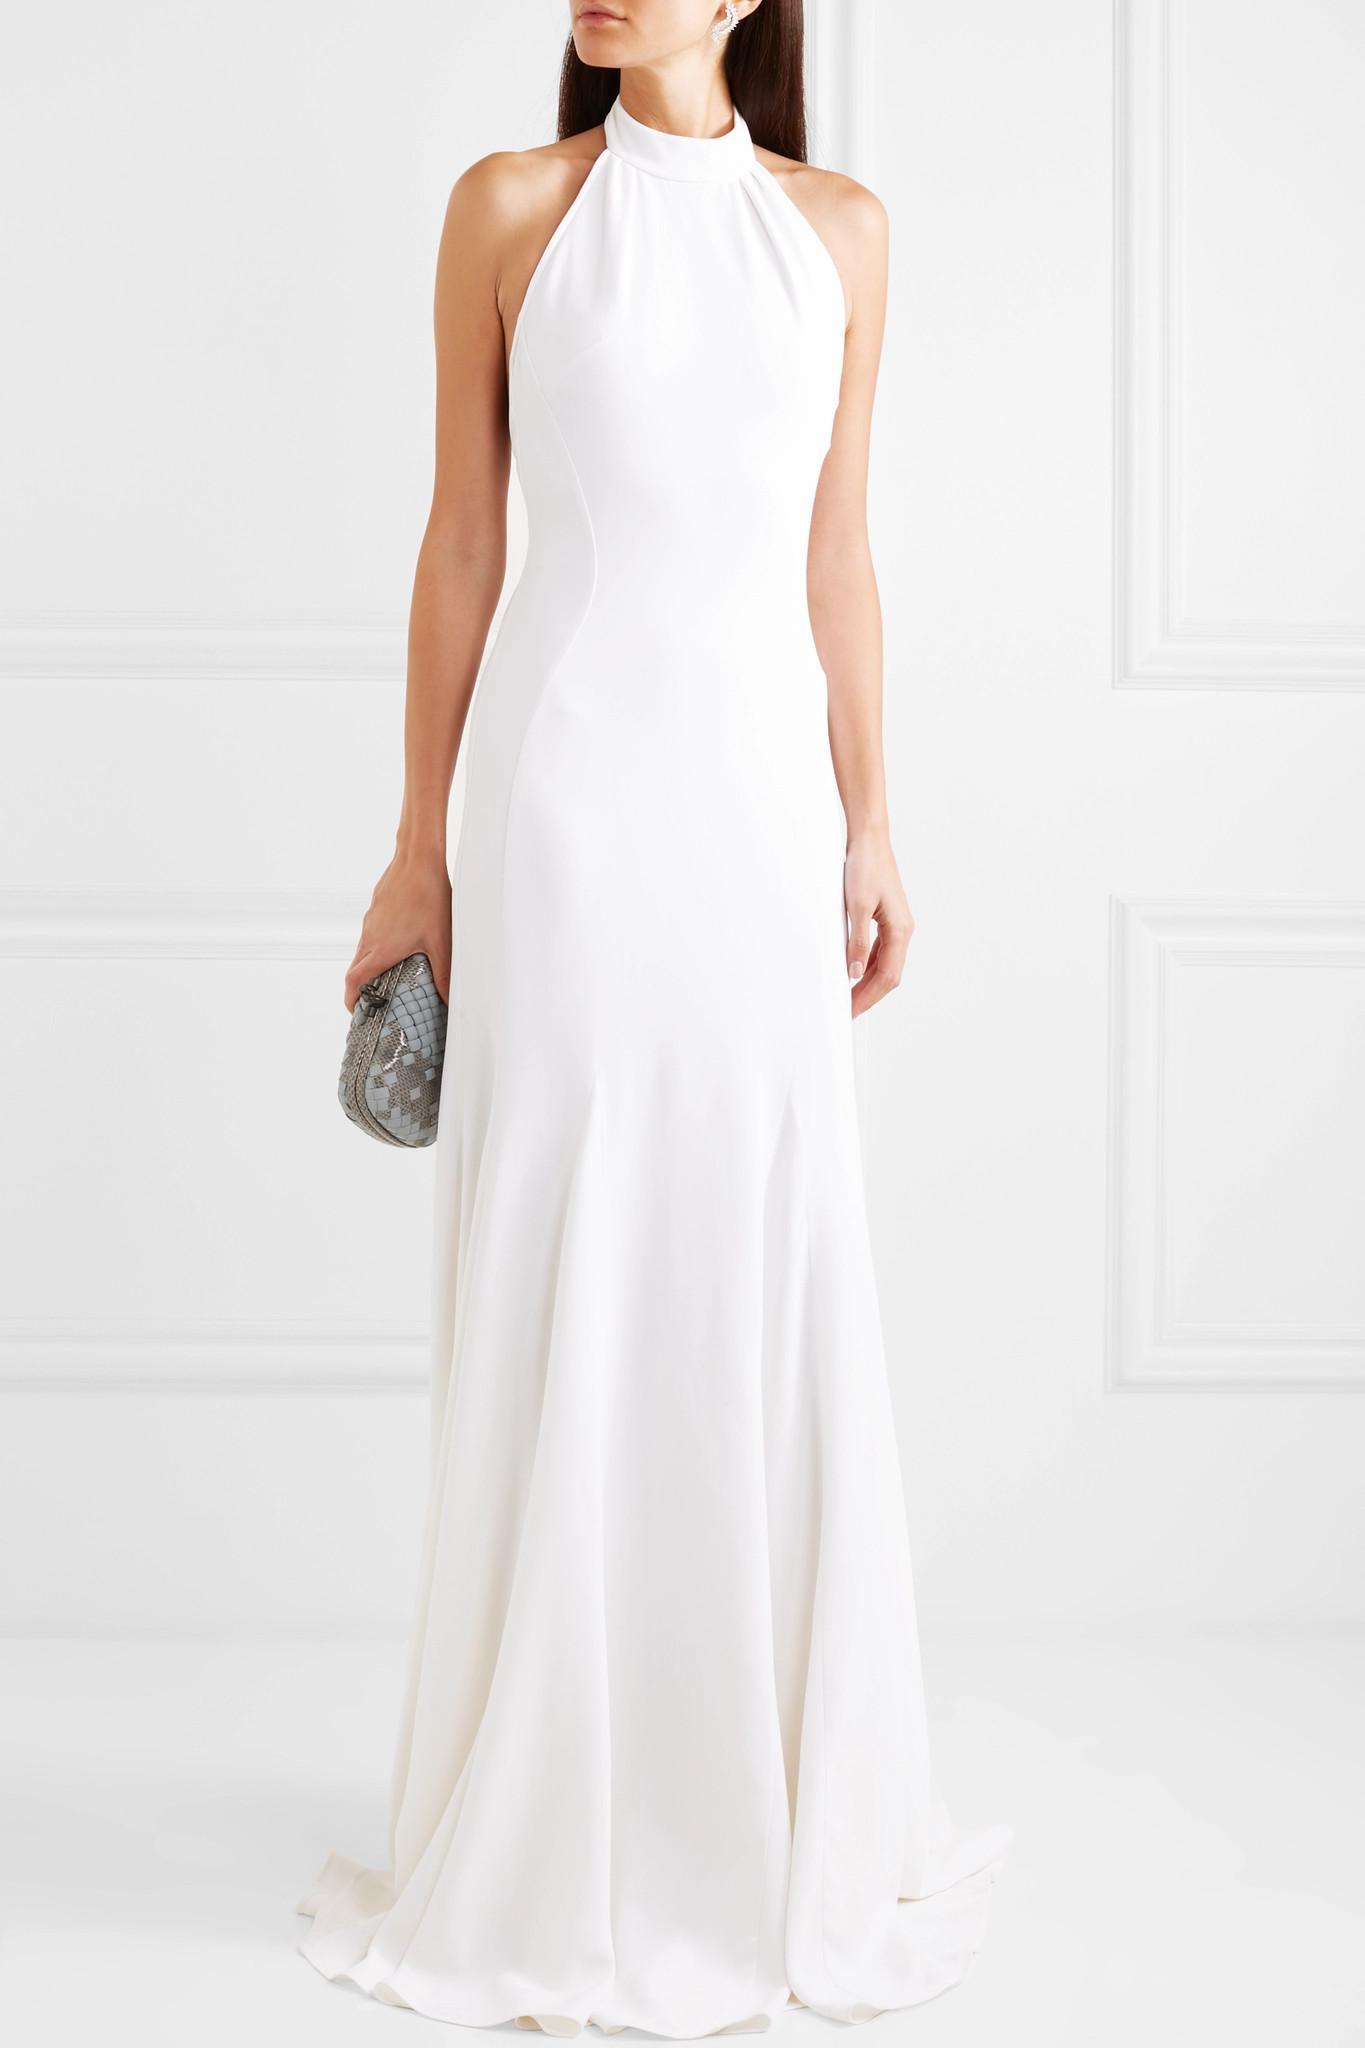 1cb47eef0768 Stella McCartney - White Stretch-crepe Halterneck Gown - Lyst. View  fullscreen